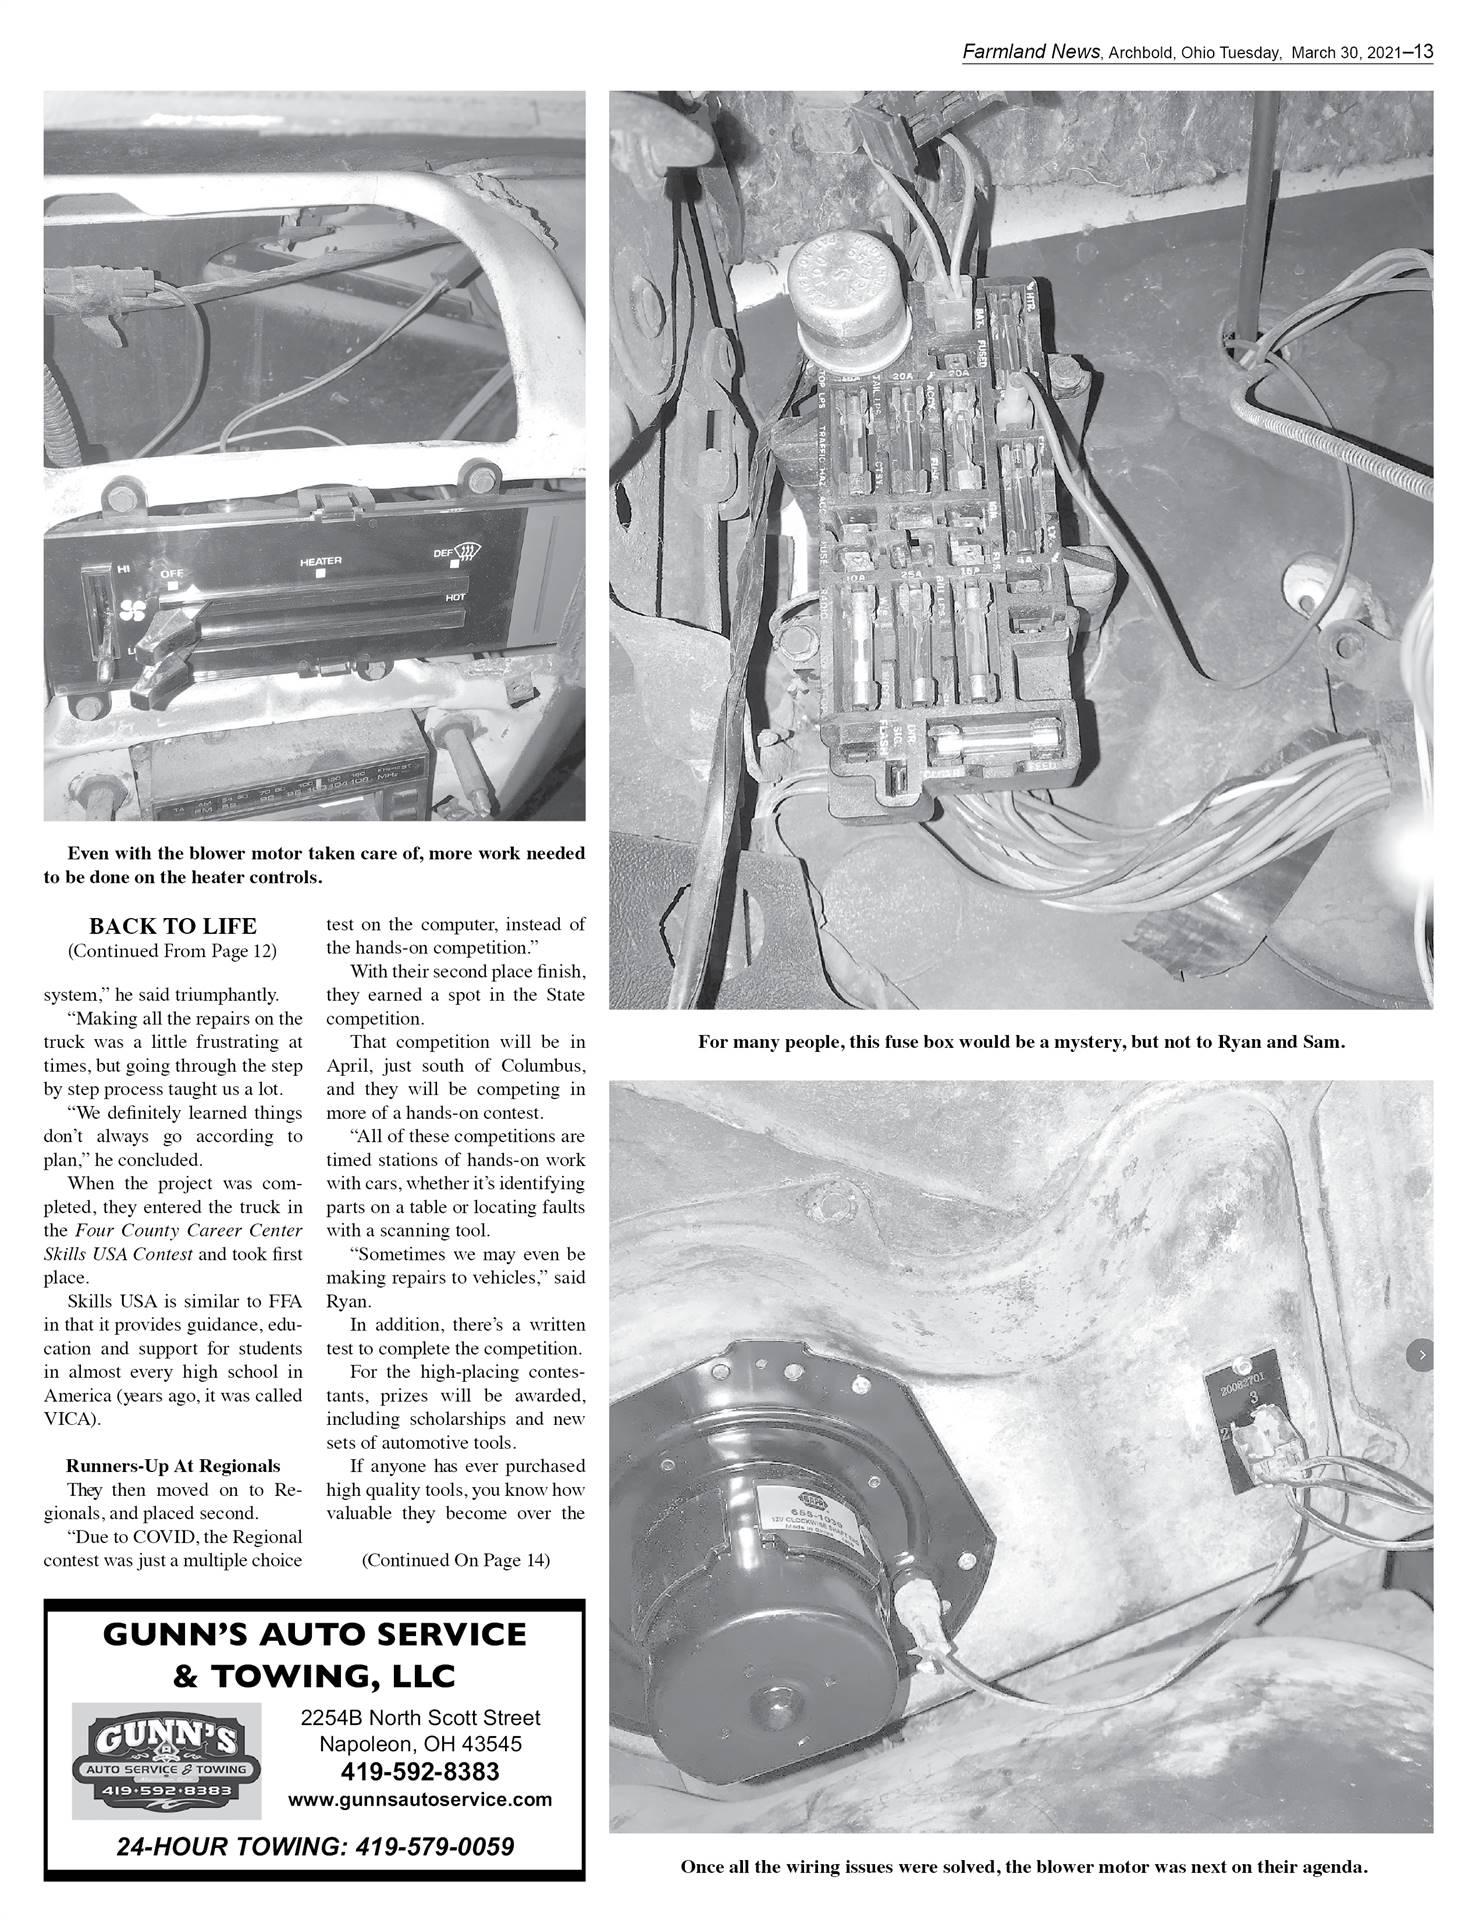 Farmland News Story - Page 5